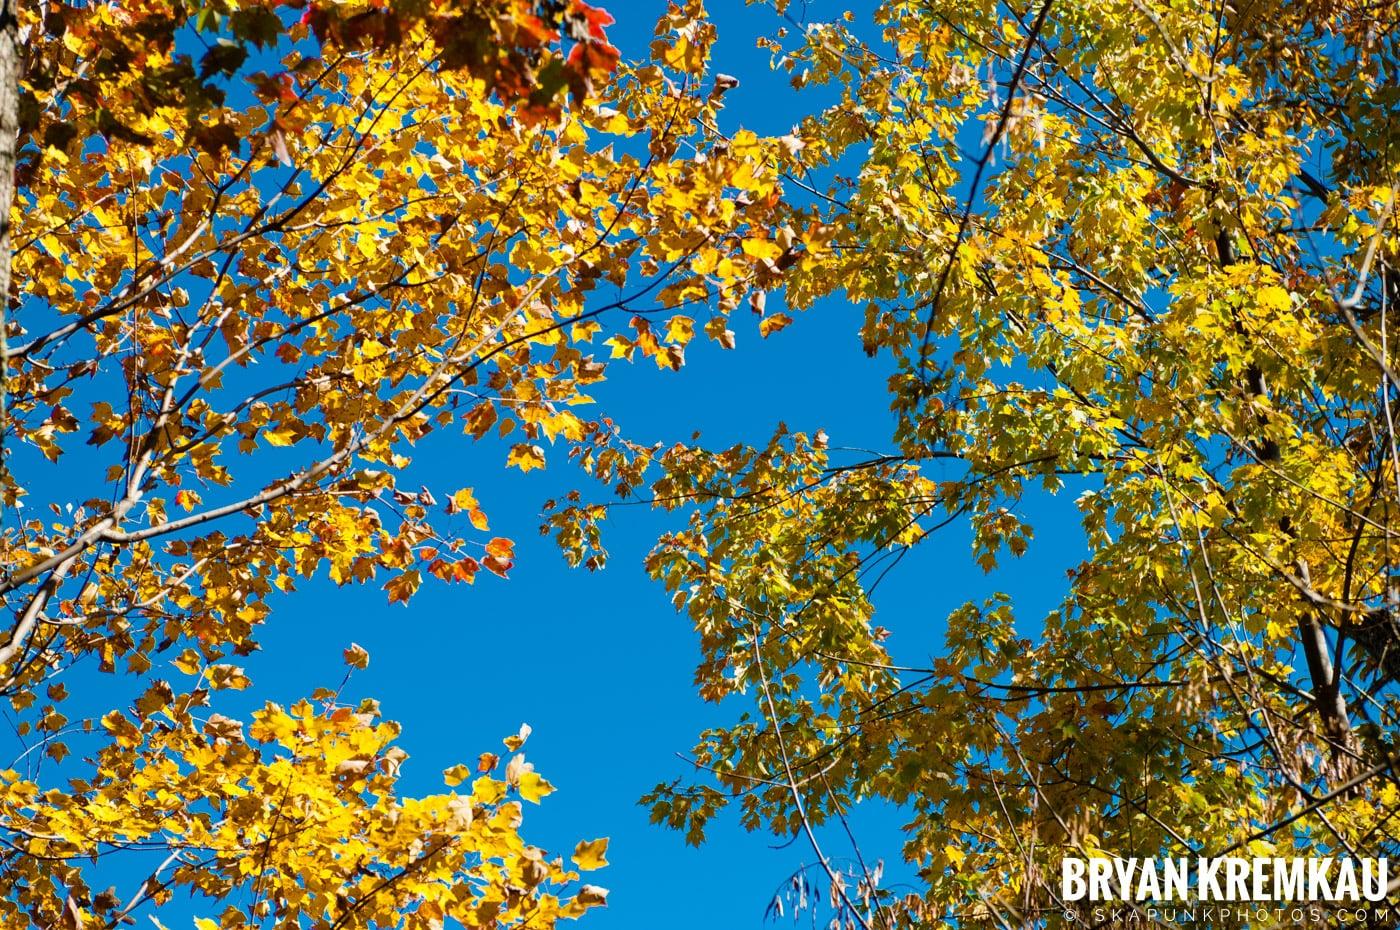 Minnewaska State Park Preserve @ Wawarsing, New York - 10.22.11 (1)